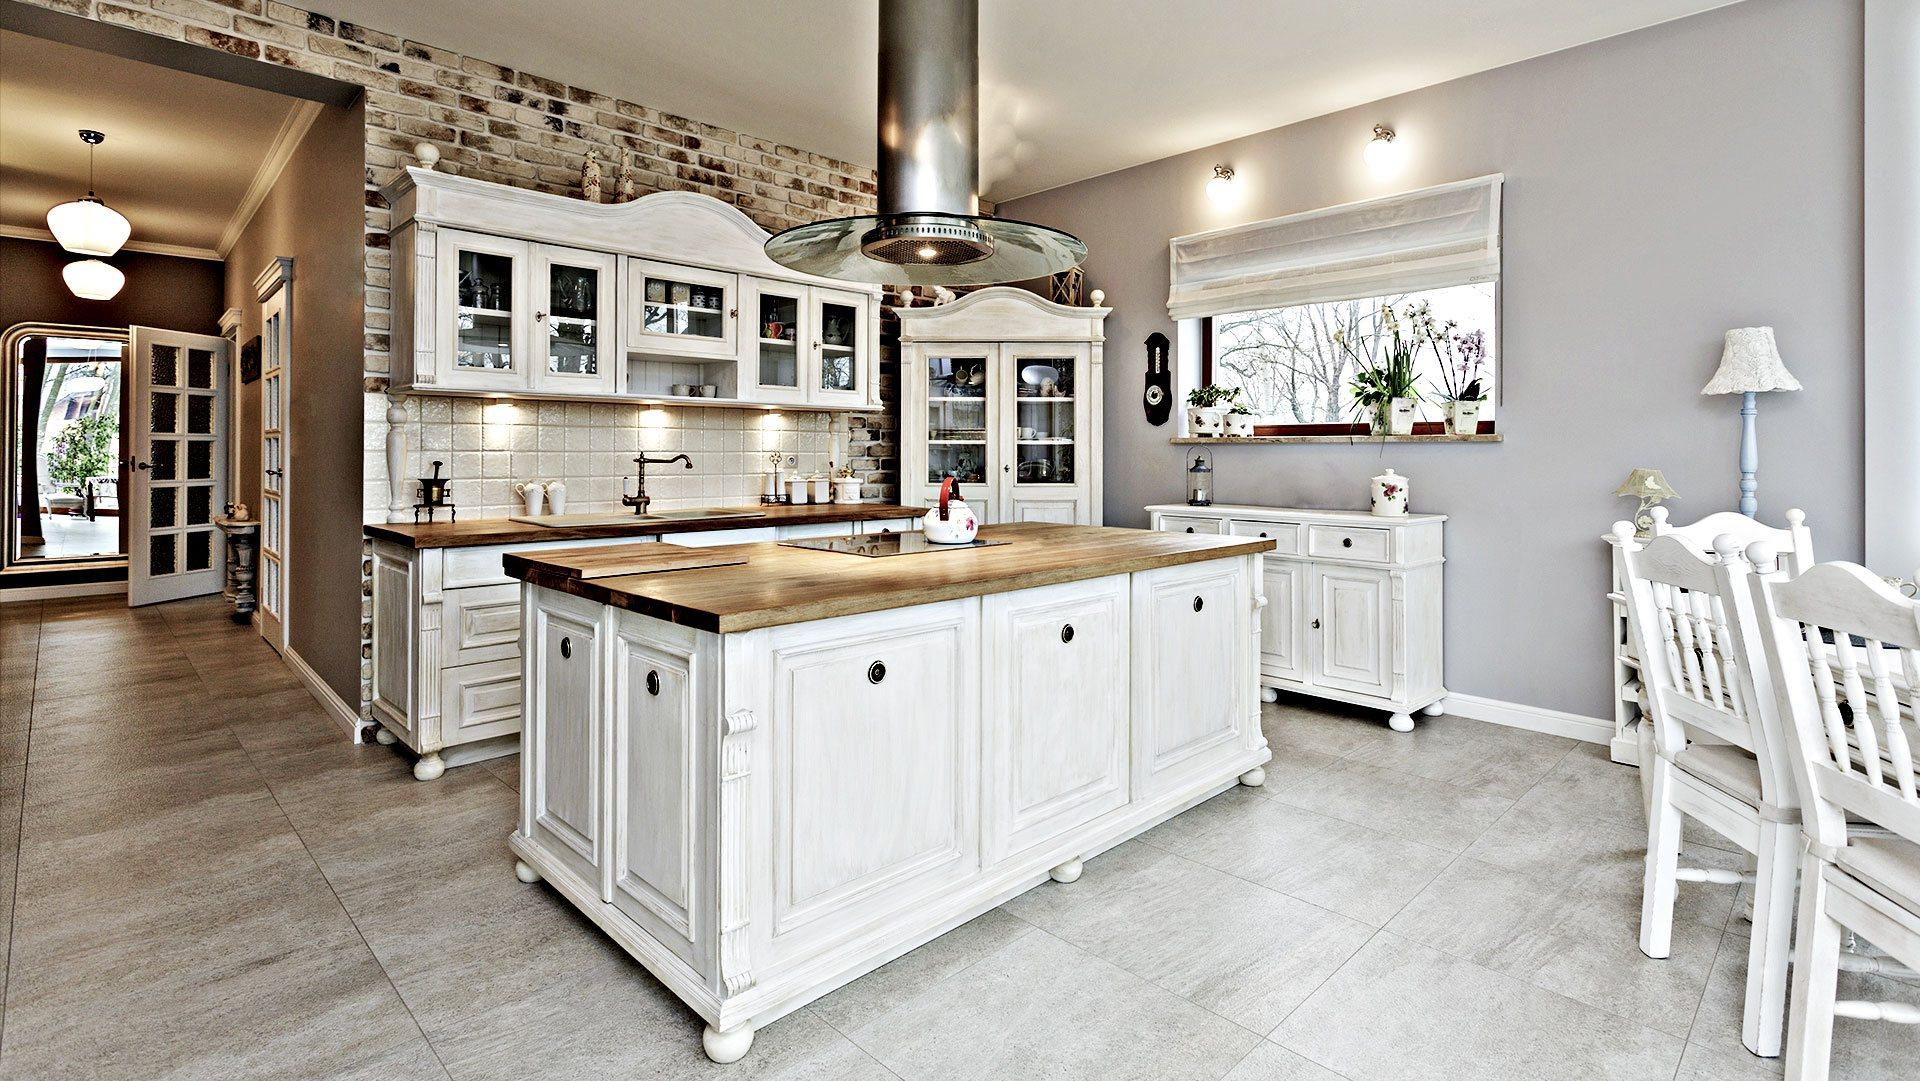 Epic Home Improvements Inc. Remodeled Kitchen 2